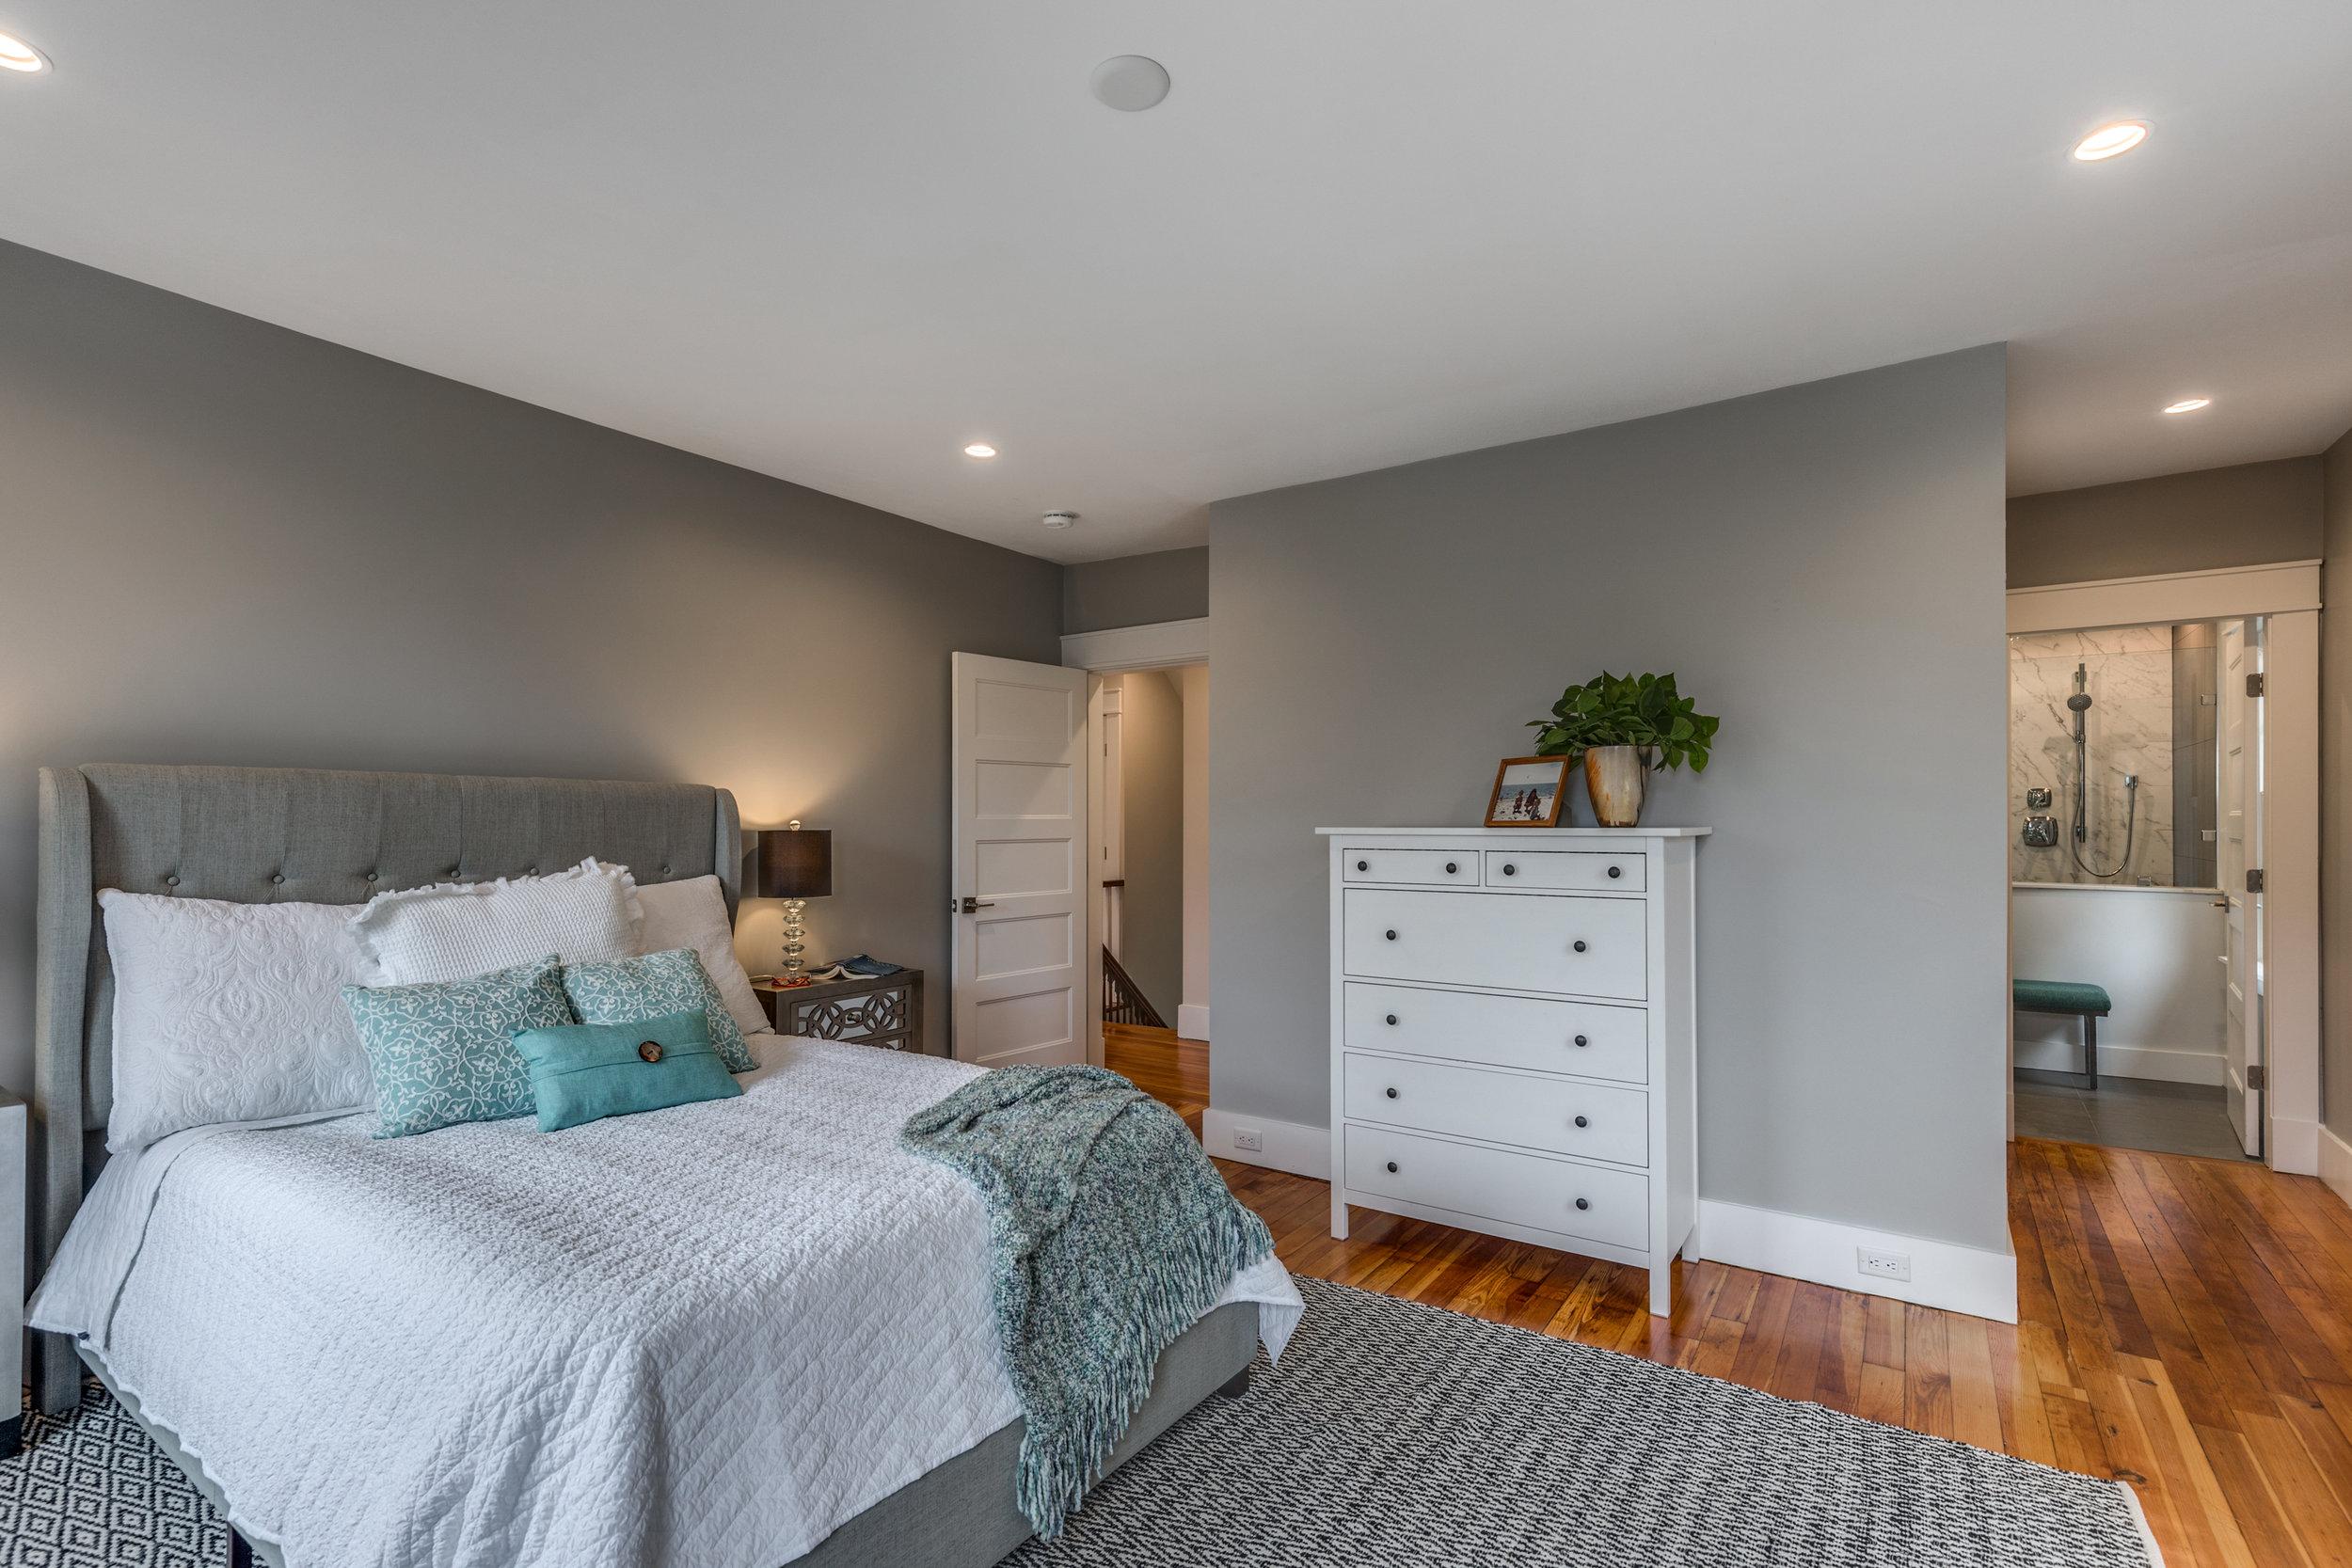 20_Bedroom-4.jpg